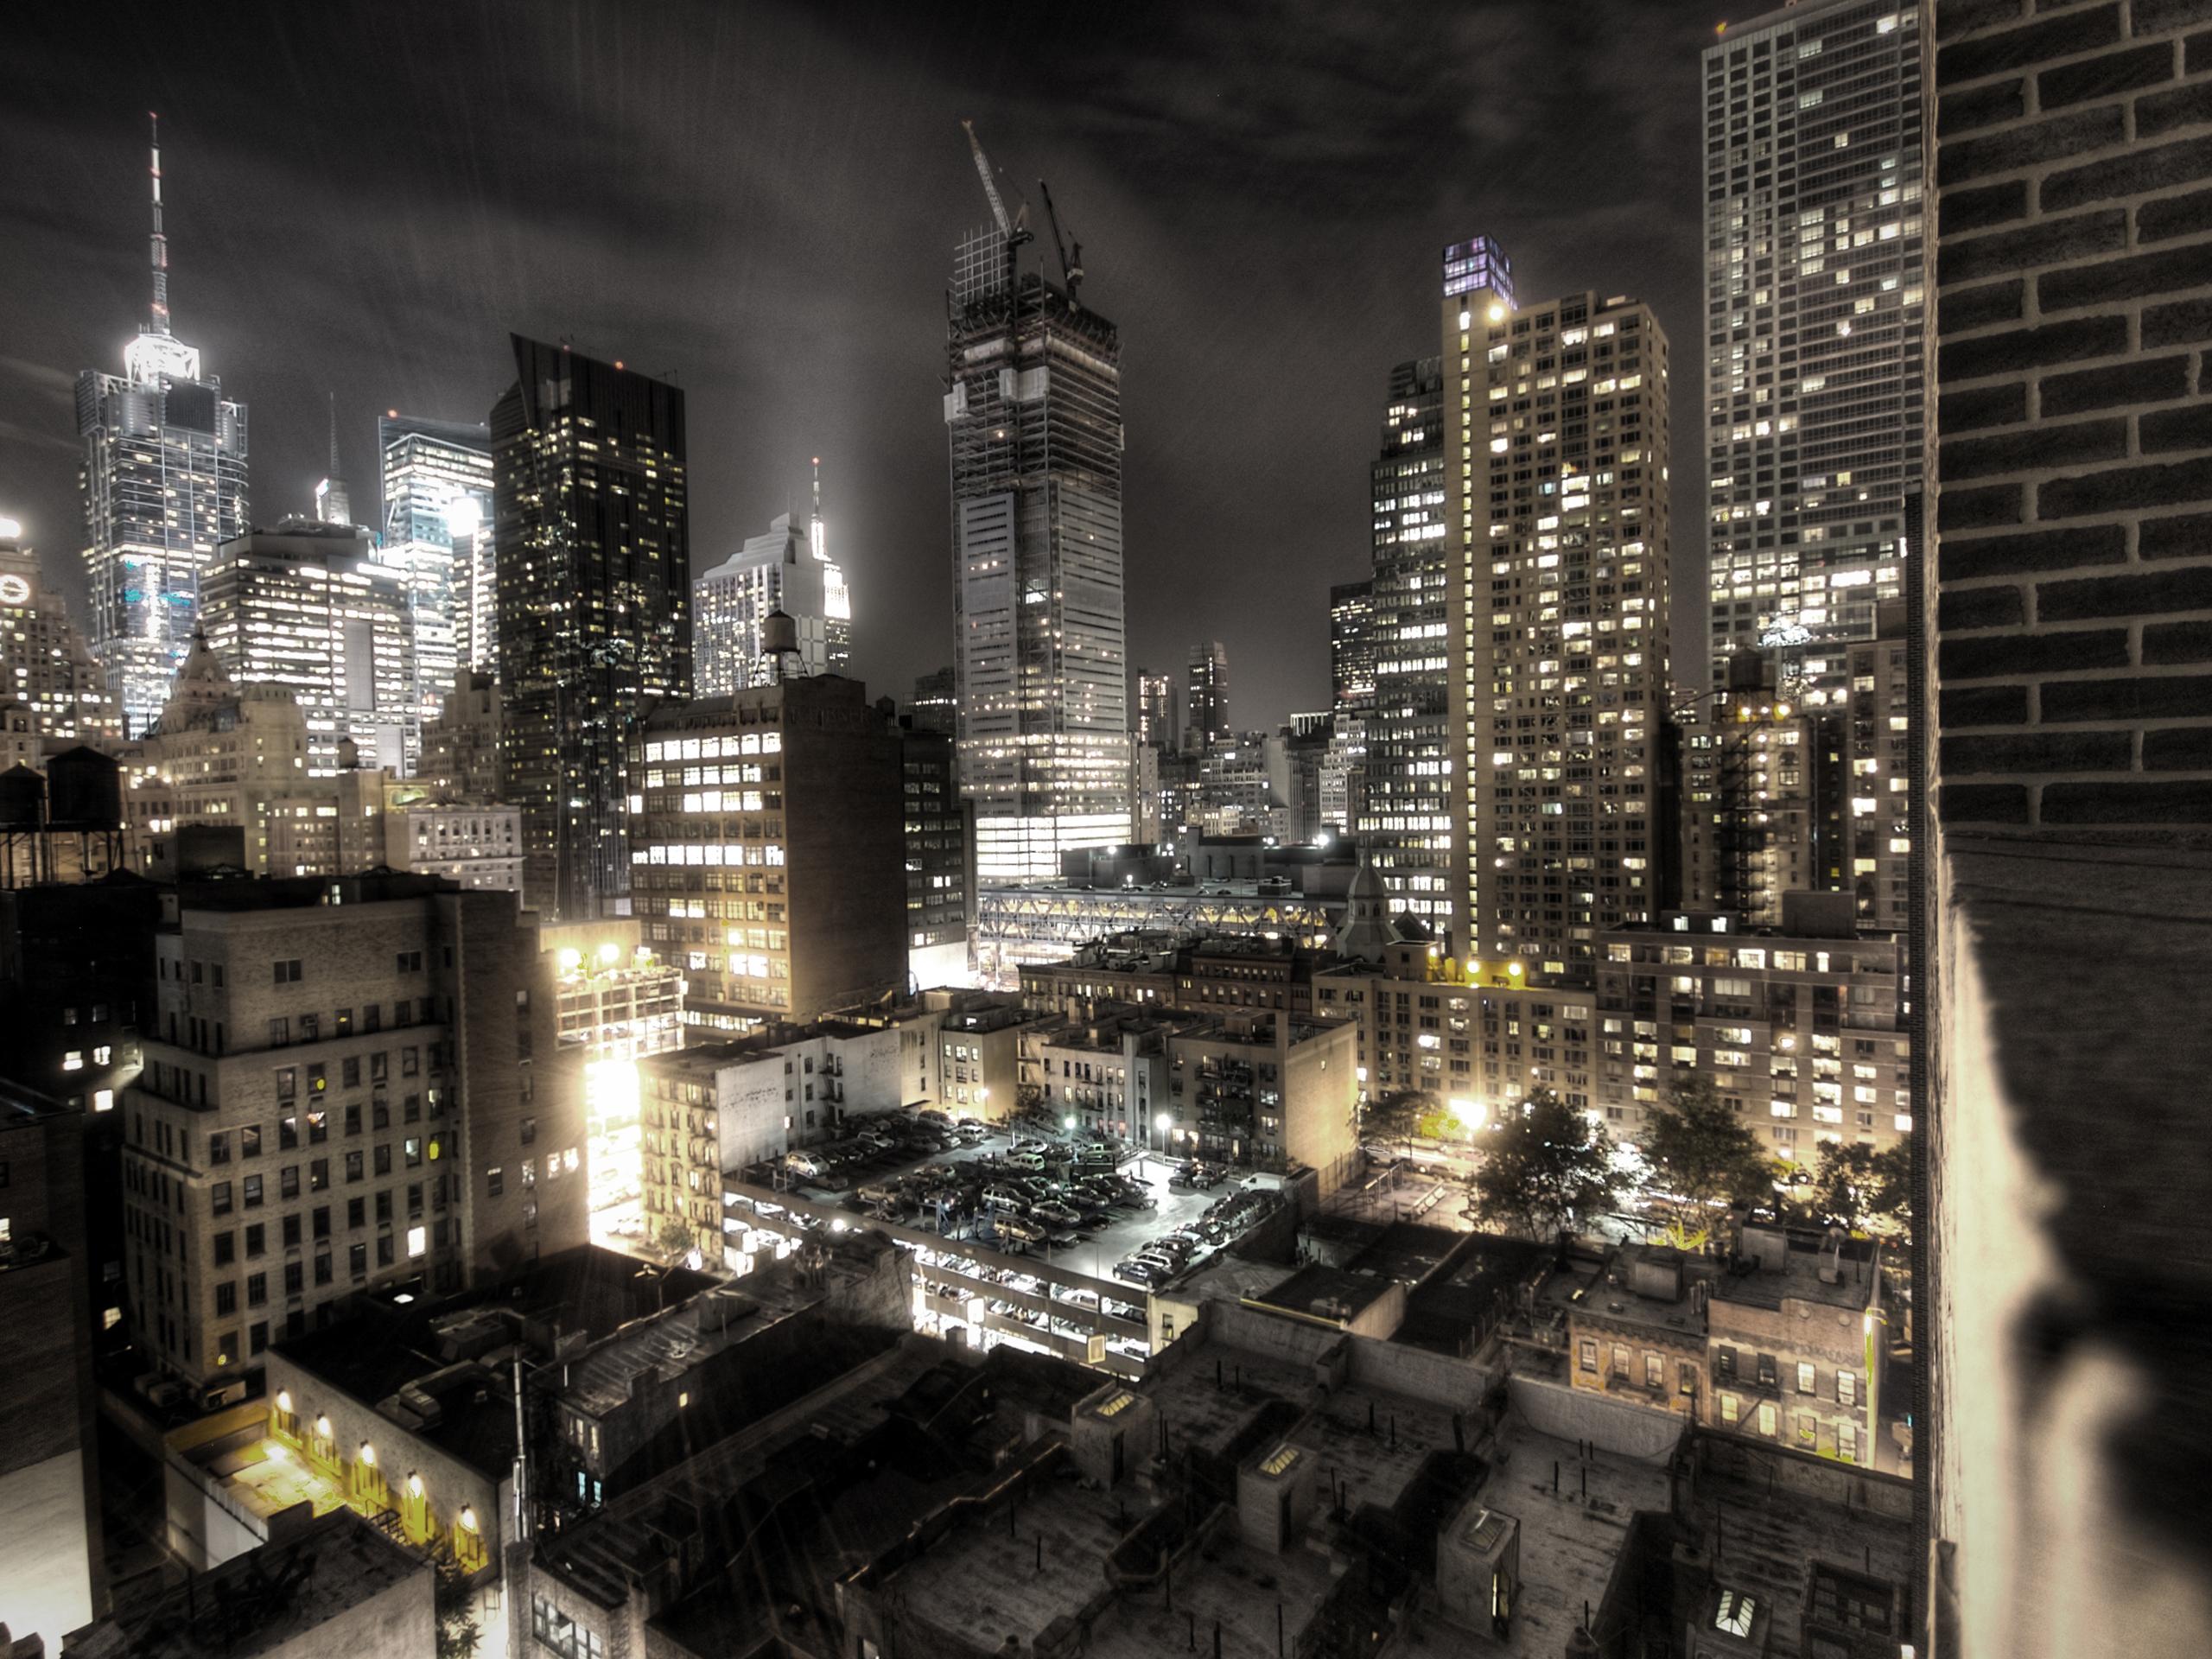 definition wallpapercomphotonew york cityscape wallpaper13html 2560x1920